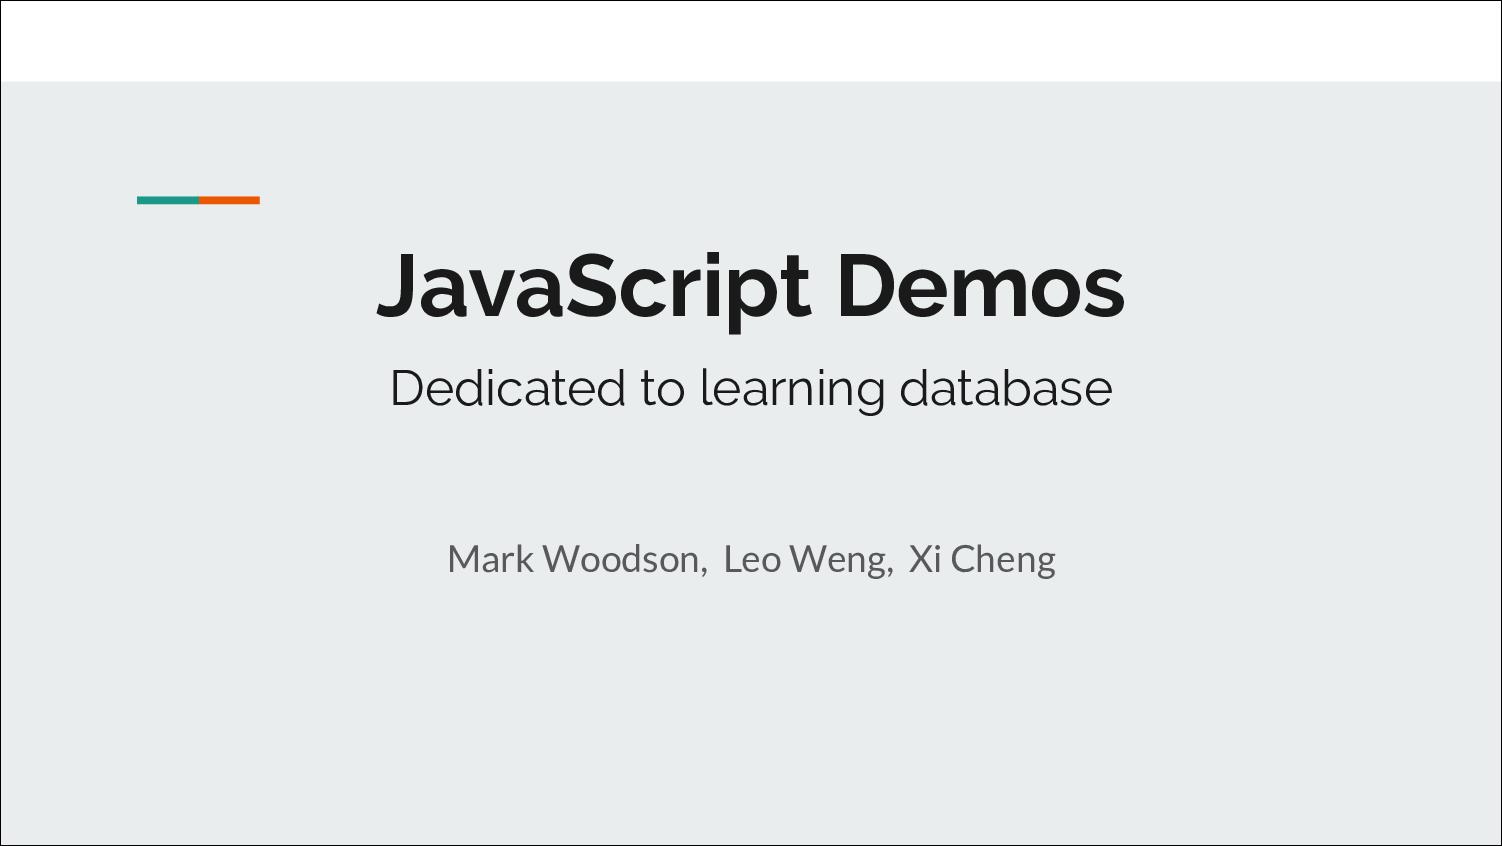 [PRESENTATION] Learning Database Management Protocols via JavaScript Demos (I)